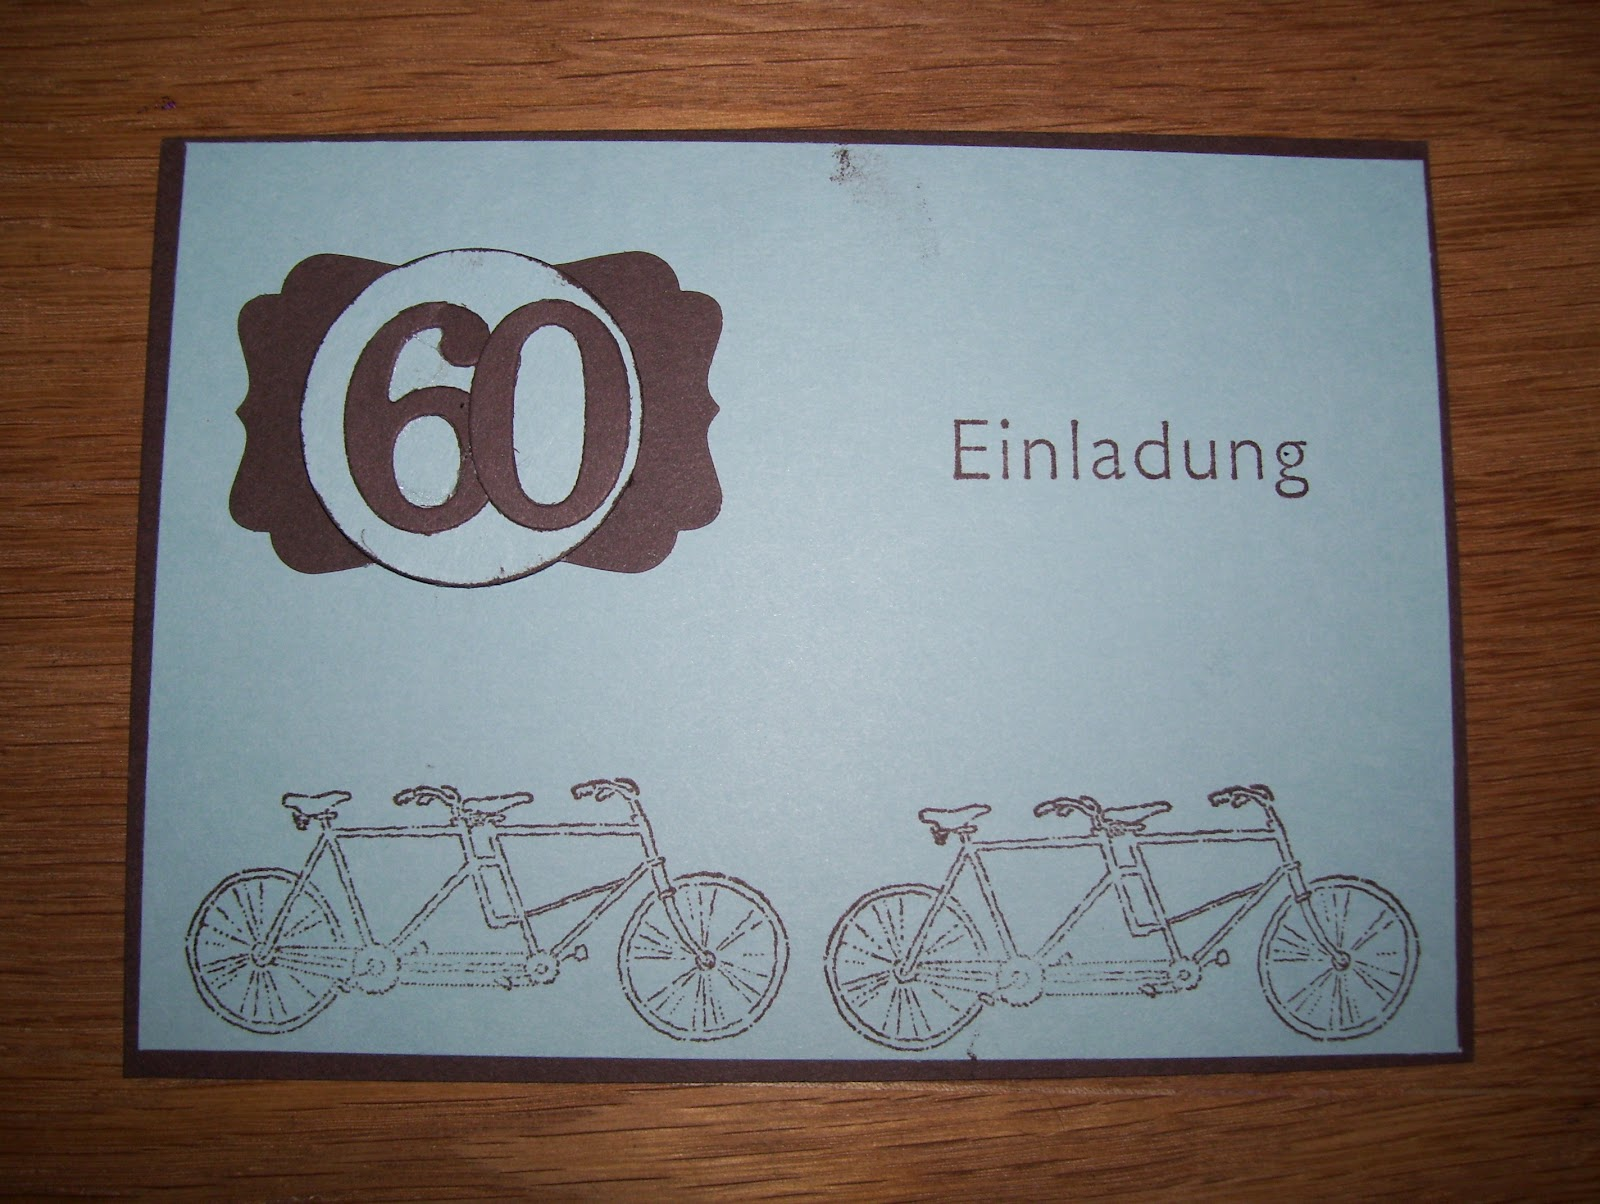 Zum 60 Geburtstag